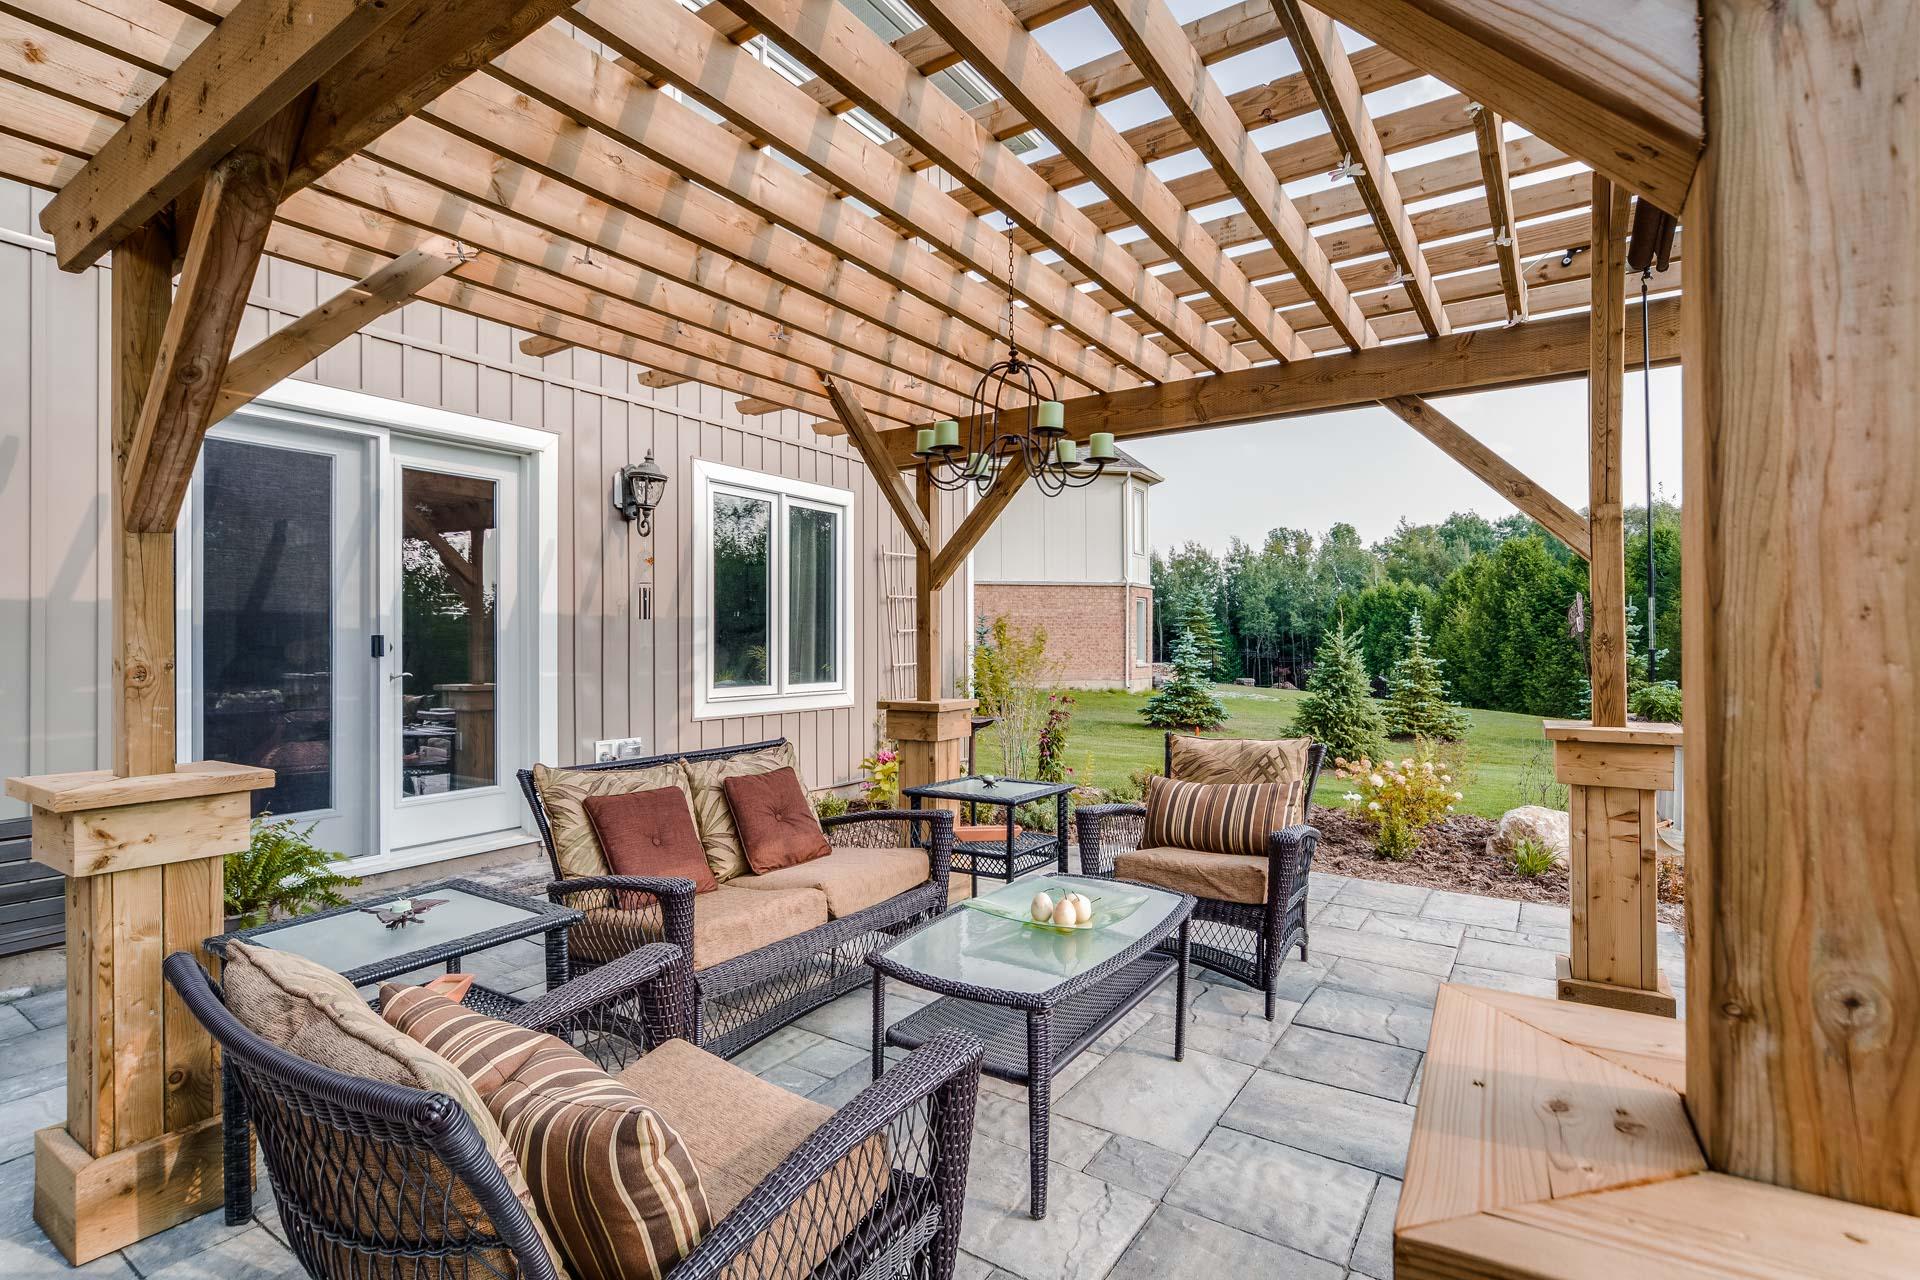 Stone patio, Wooden Pergola